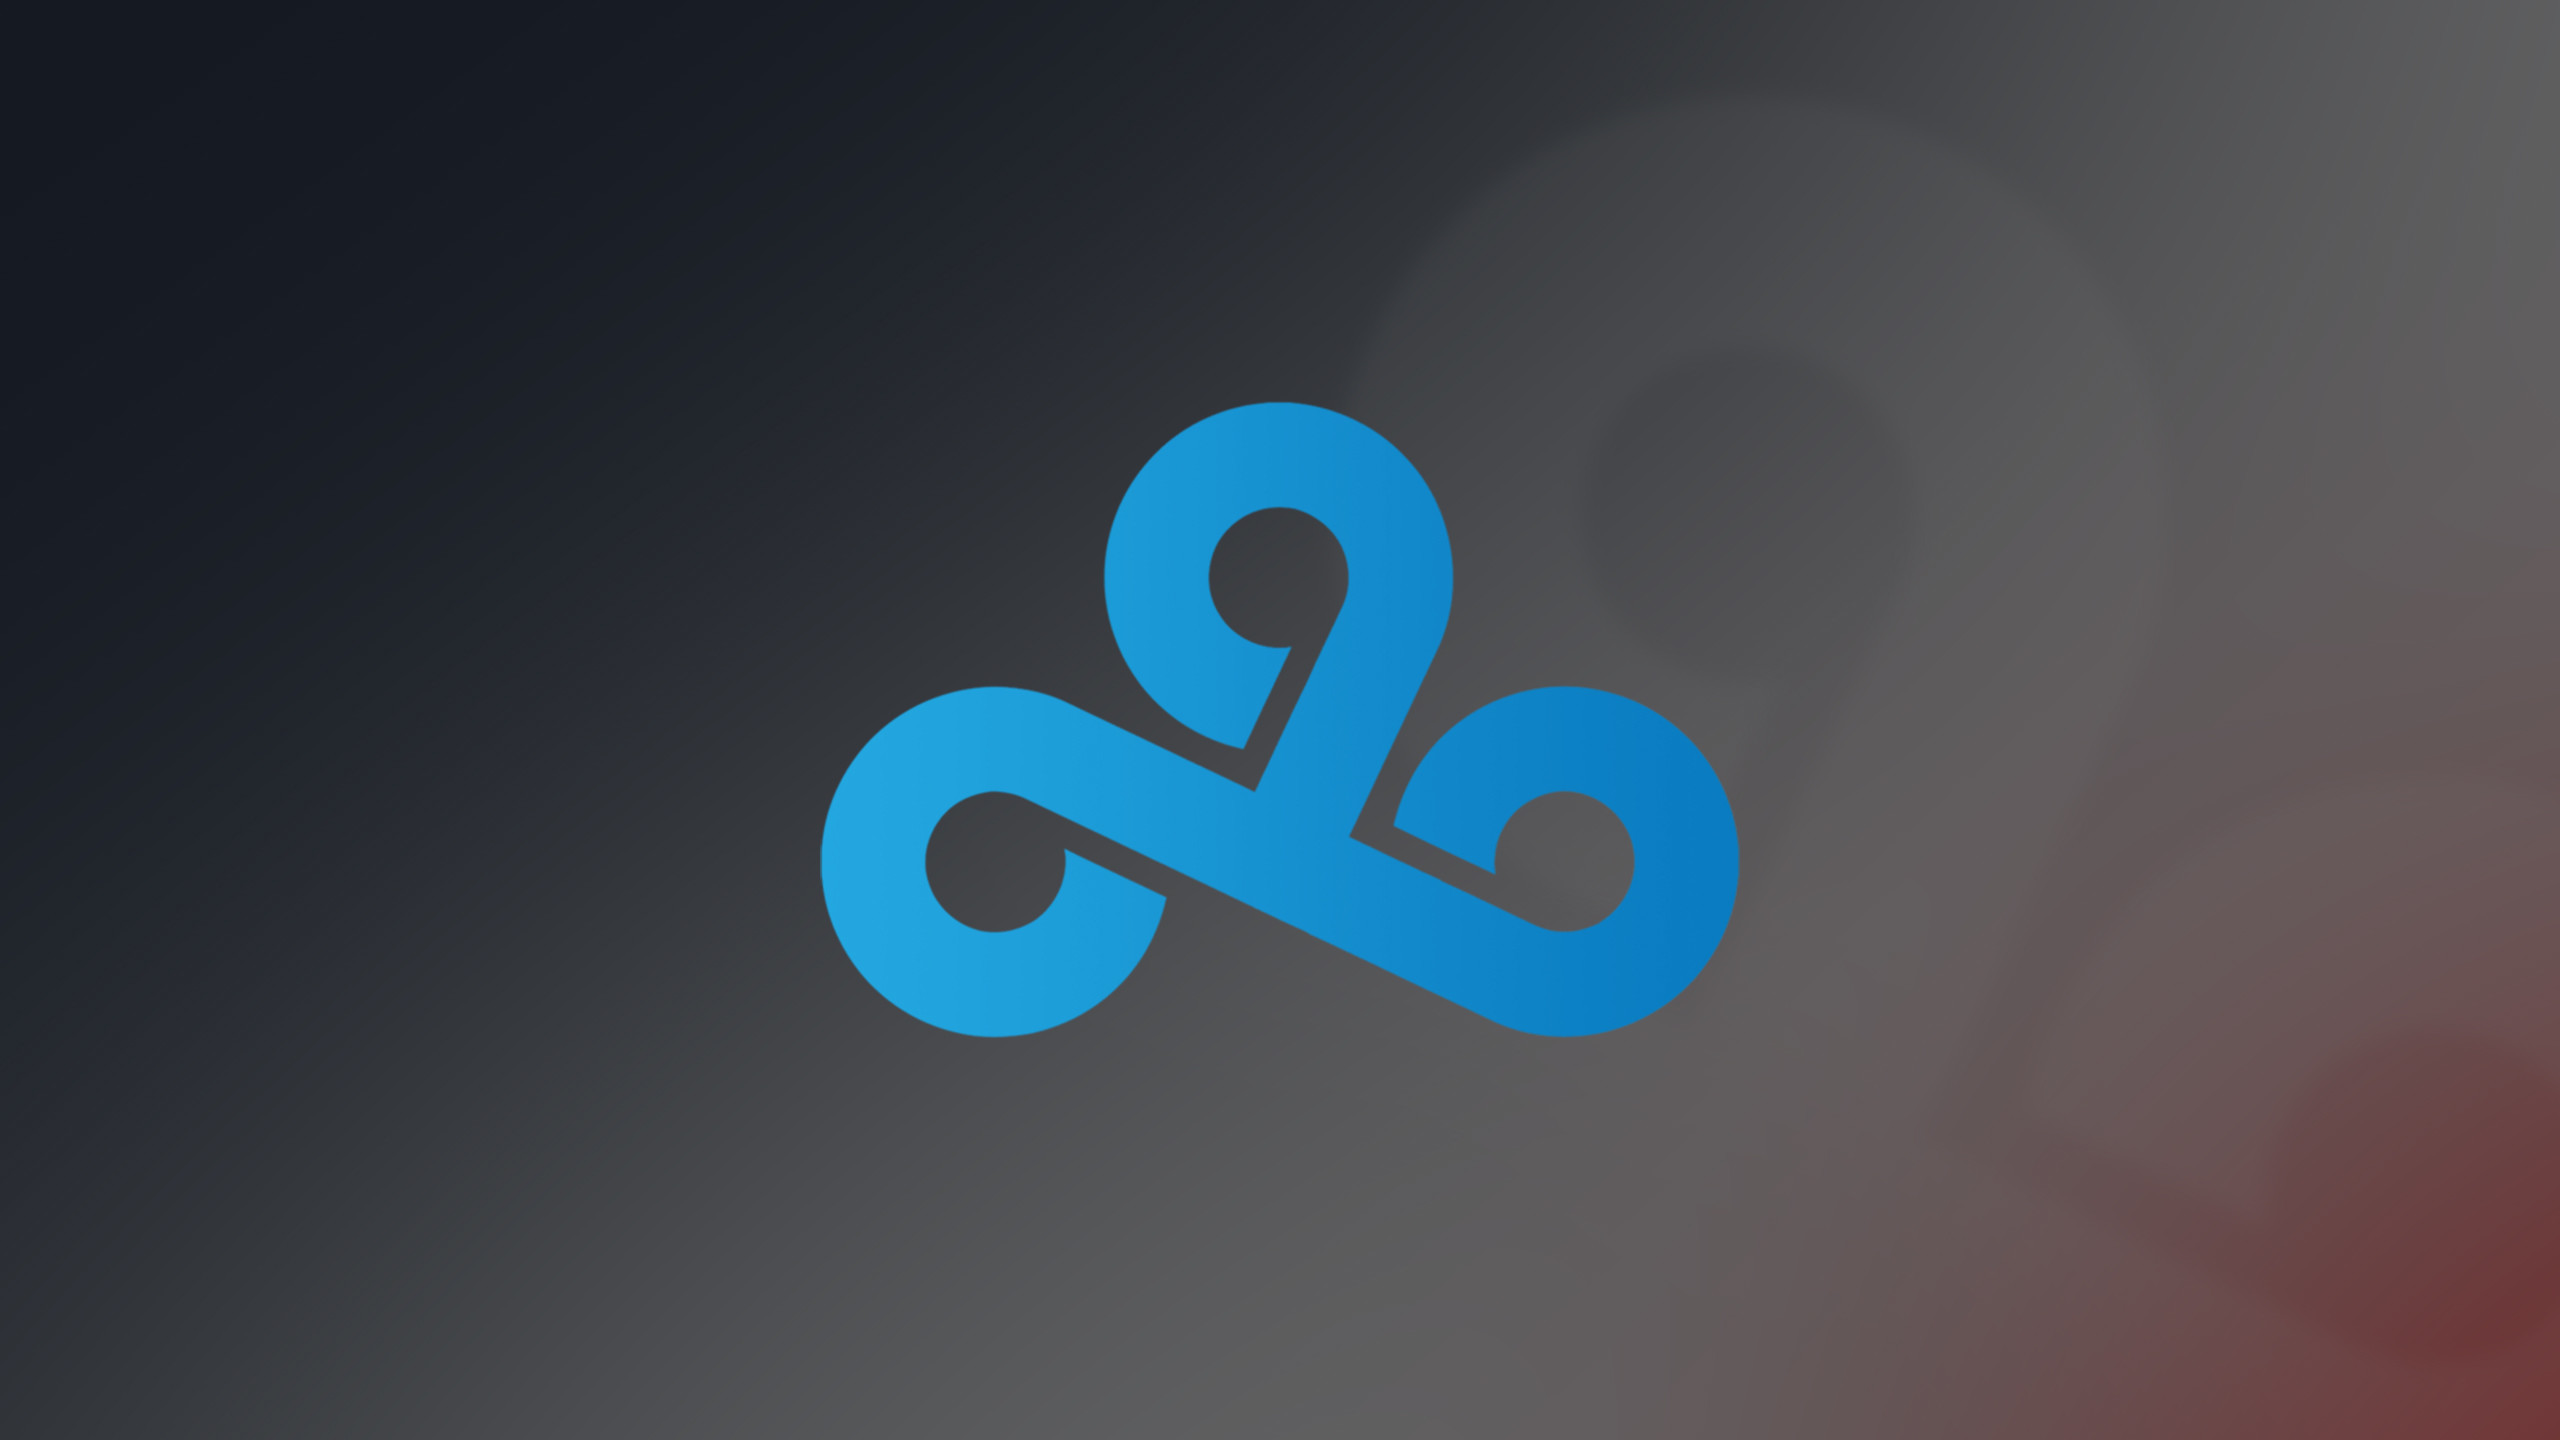 30+ Cloud 9 Wallpaper Iphone PNG